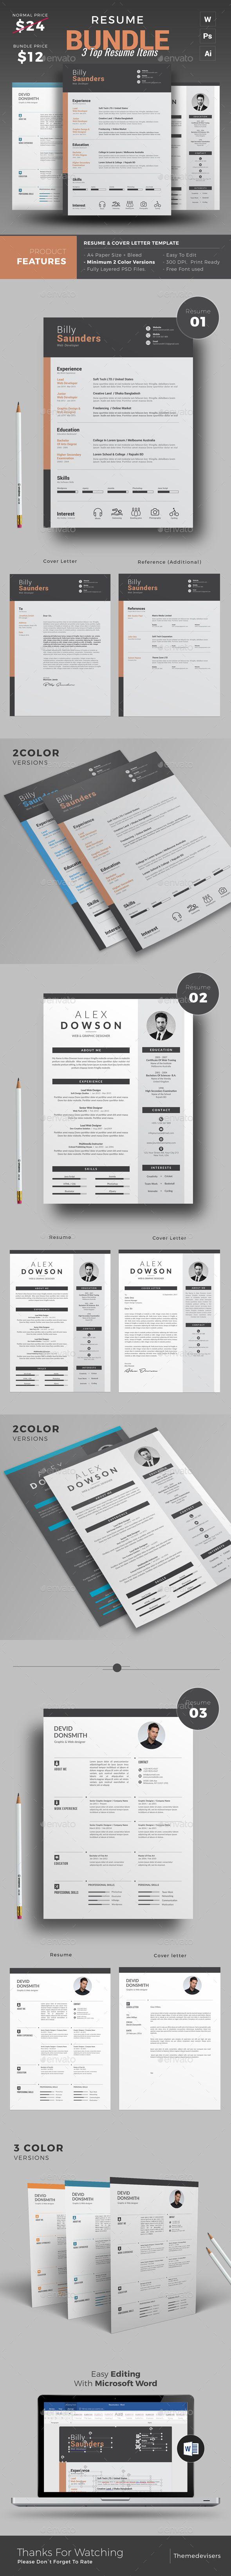 12 best Resume images on Pinterest   Curriculum, Latex resume ...